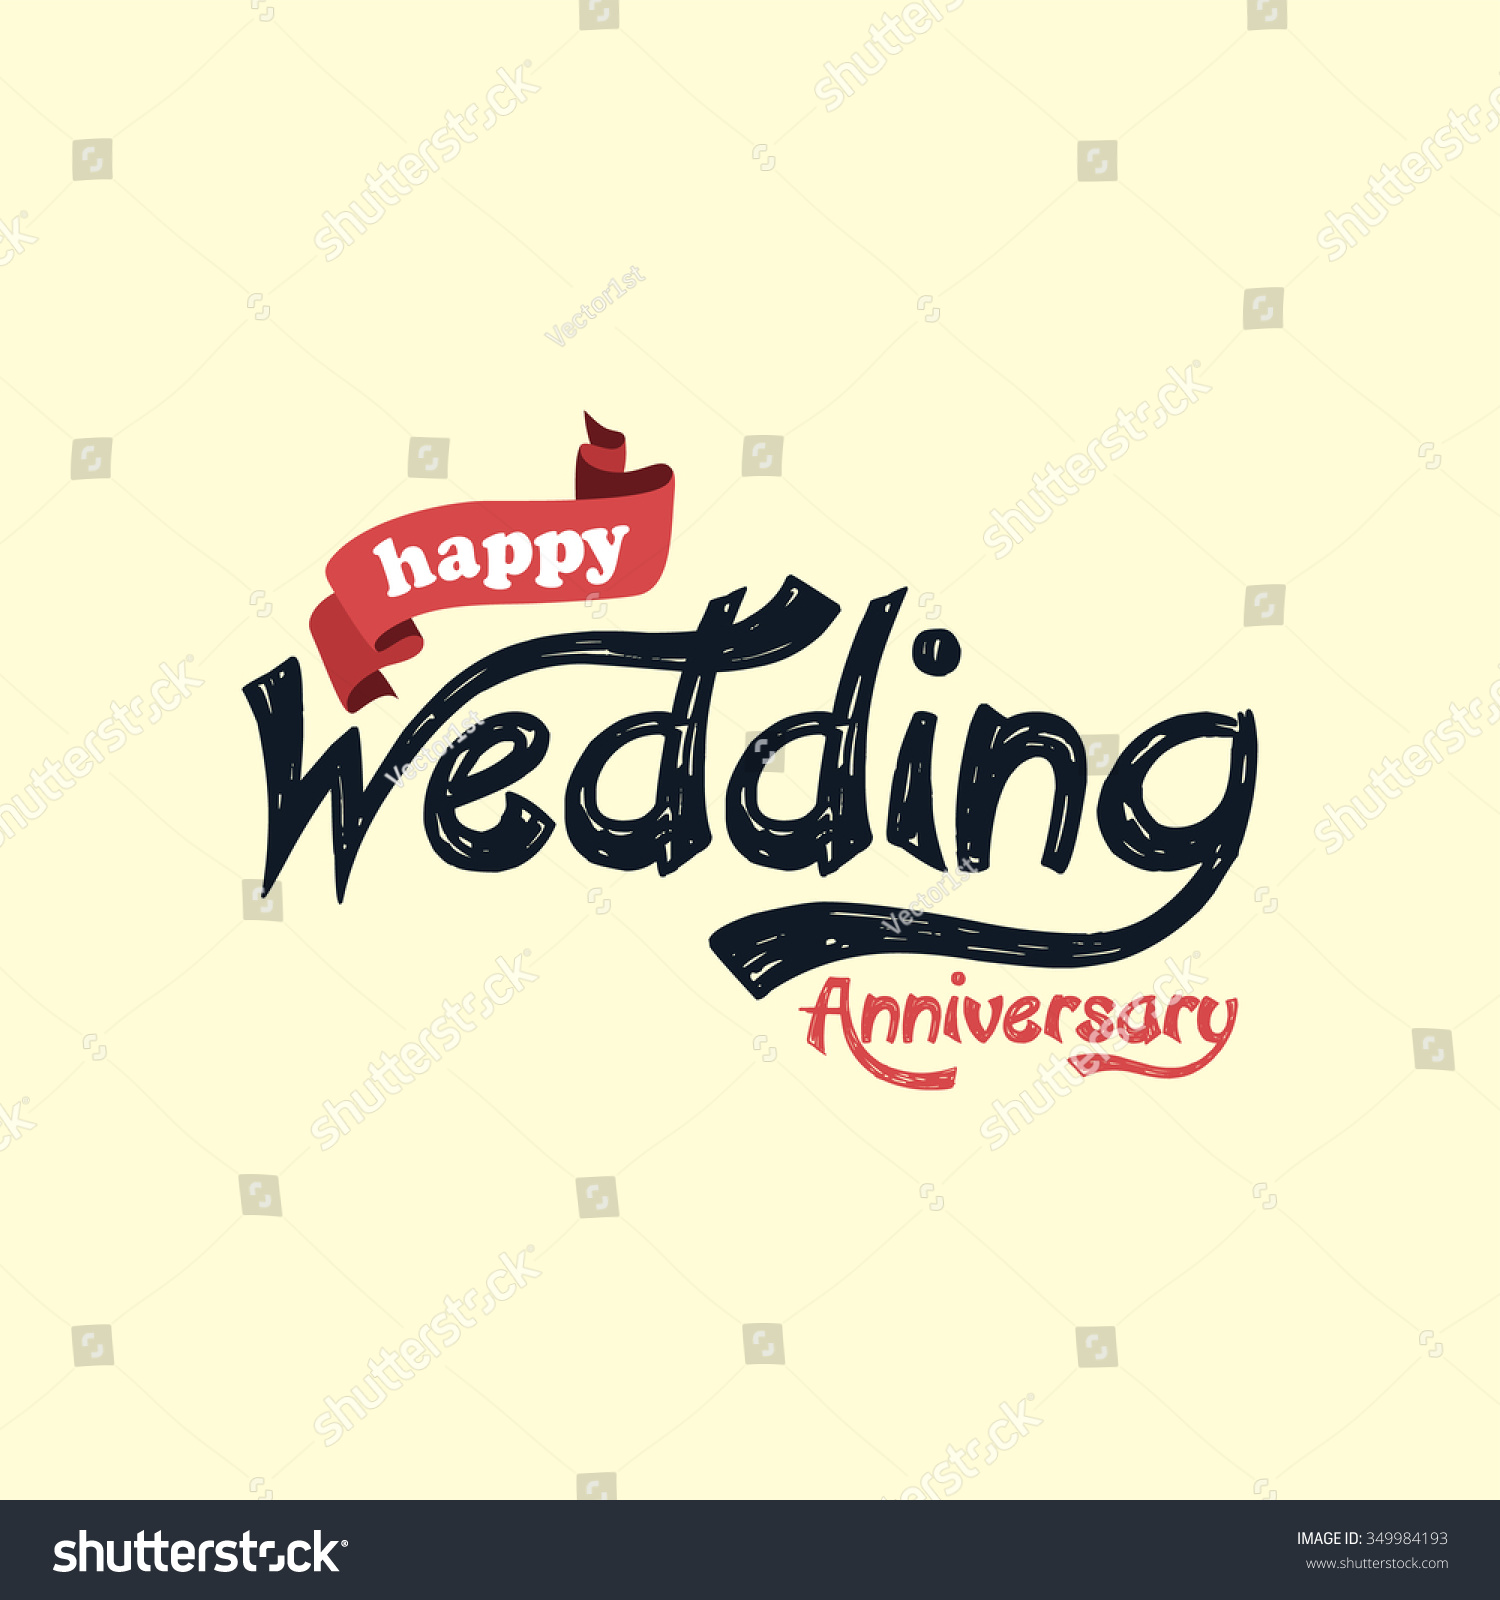 Happy Wedding Anniversary Theme Vector Art Illustration